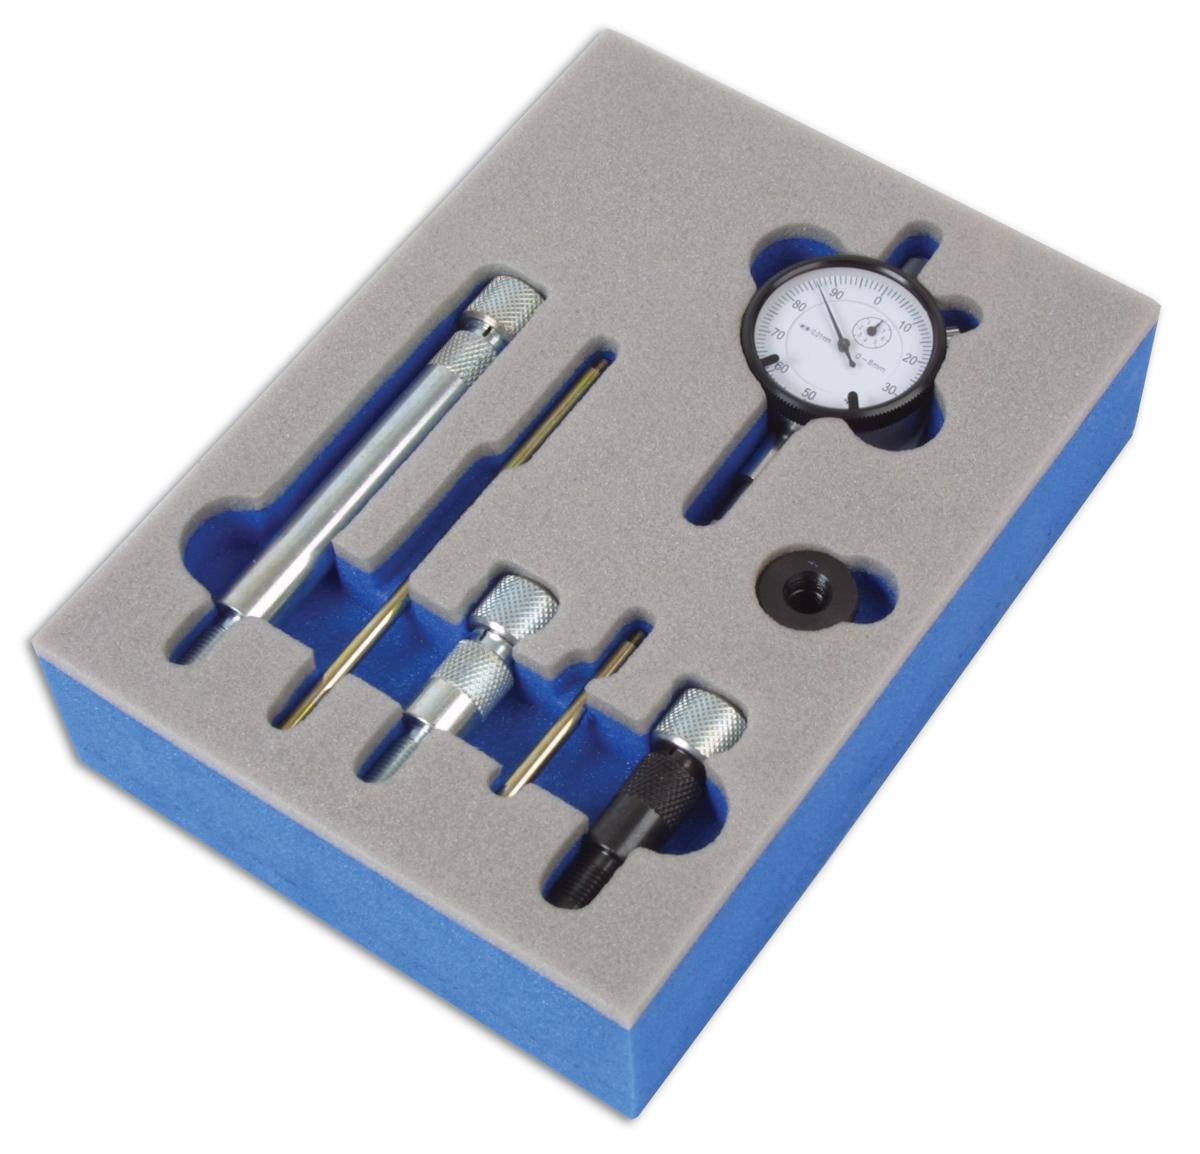 Diesel Fuel Pump Timing Kit   Part No  1870   Part of the